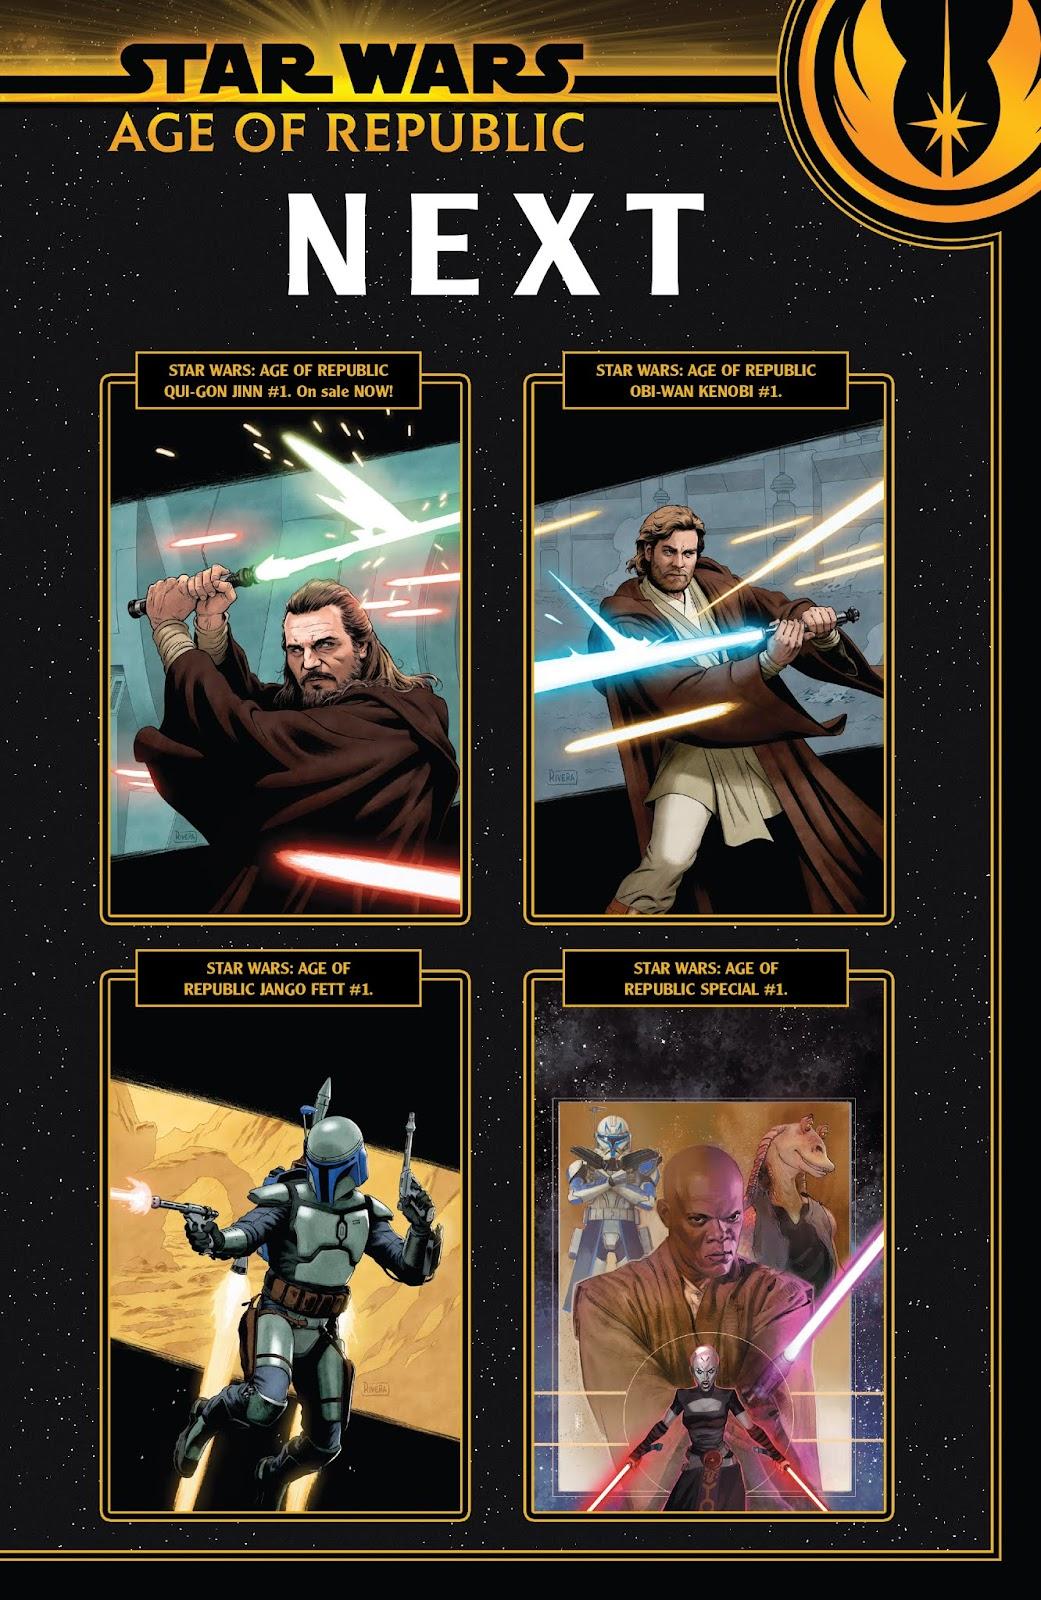 Read online Star Wars: Age of Republic - Darth Maul comic -  Issue # Full - 24